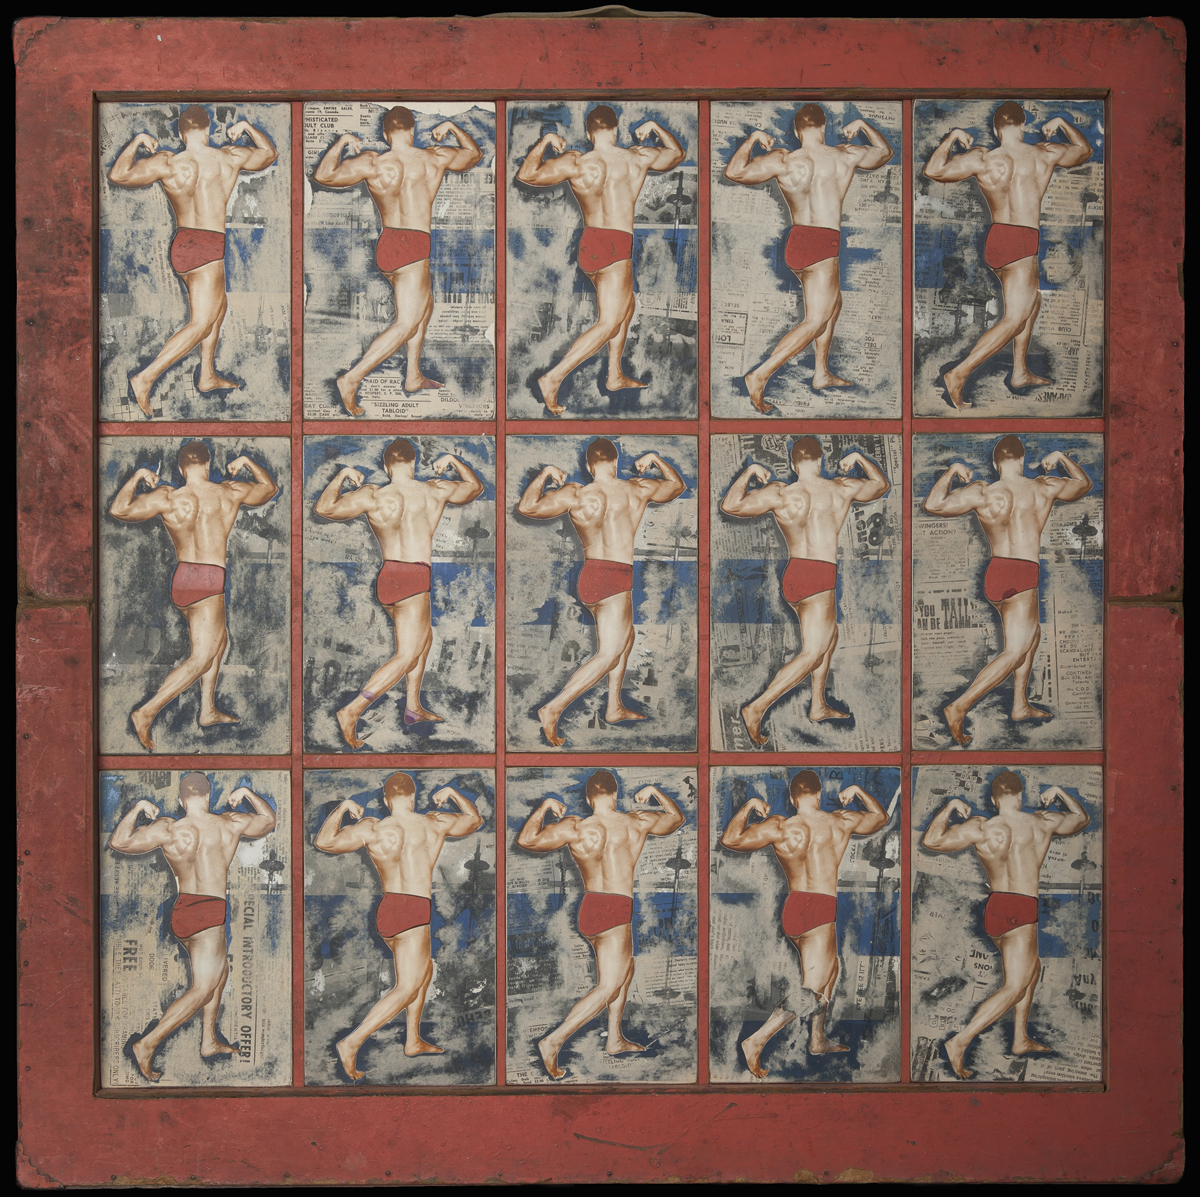 Picnic, 2013, 32 x 32 (Sold)